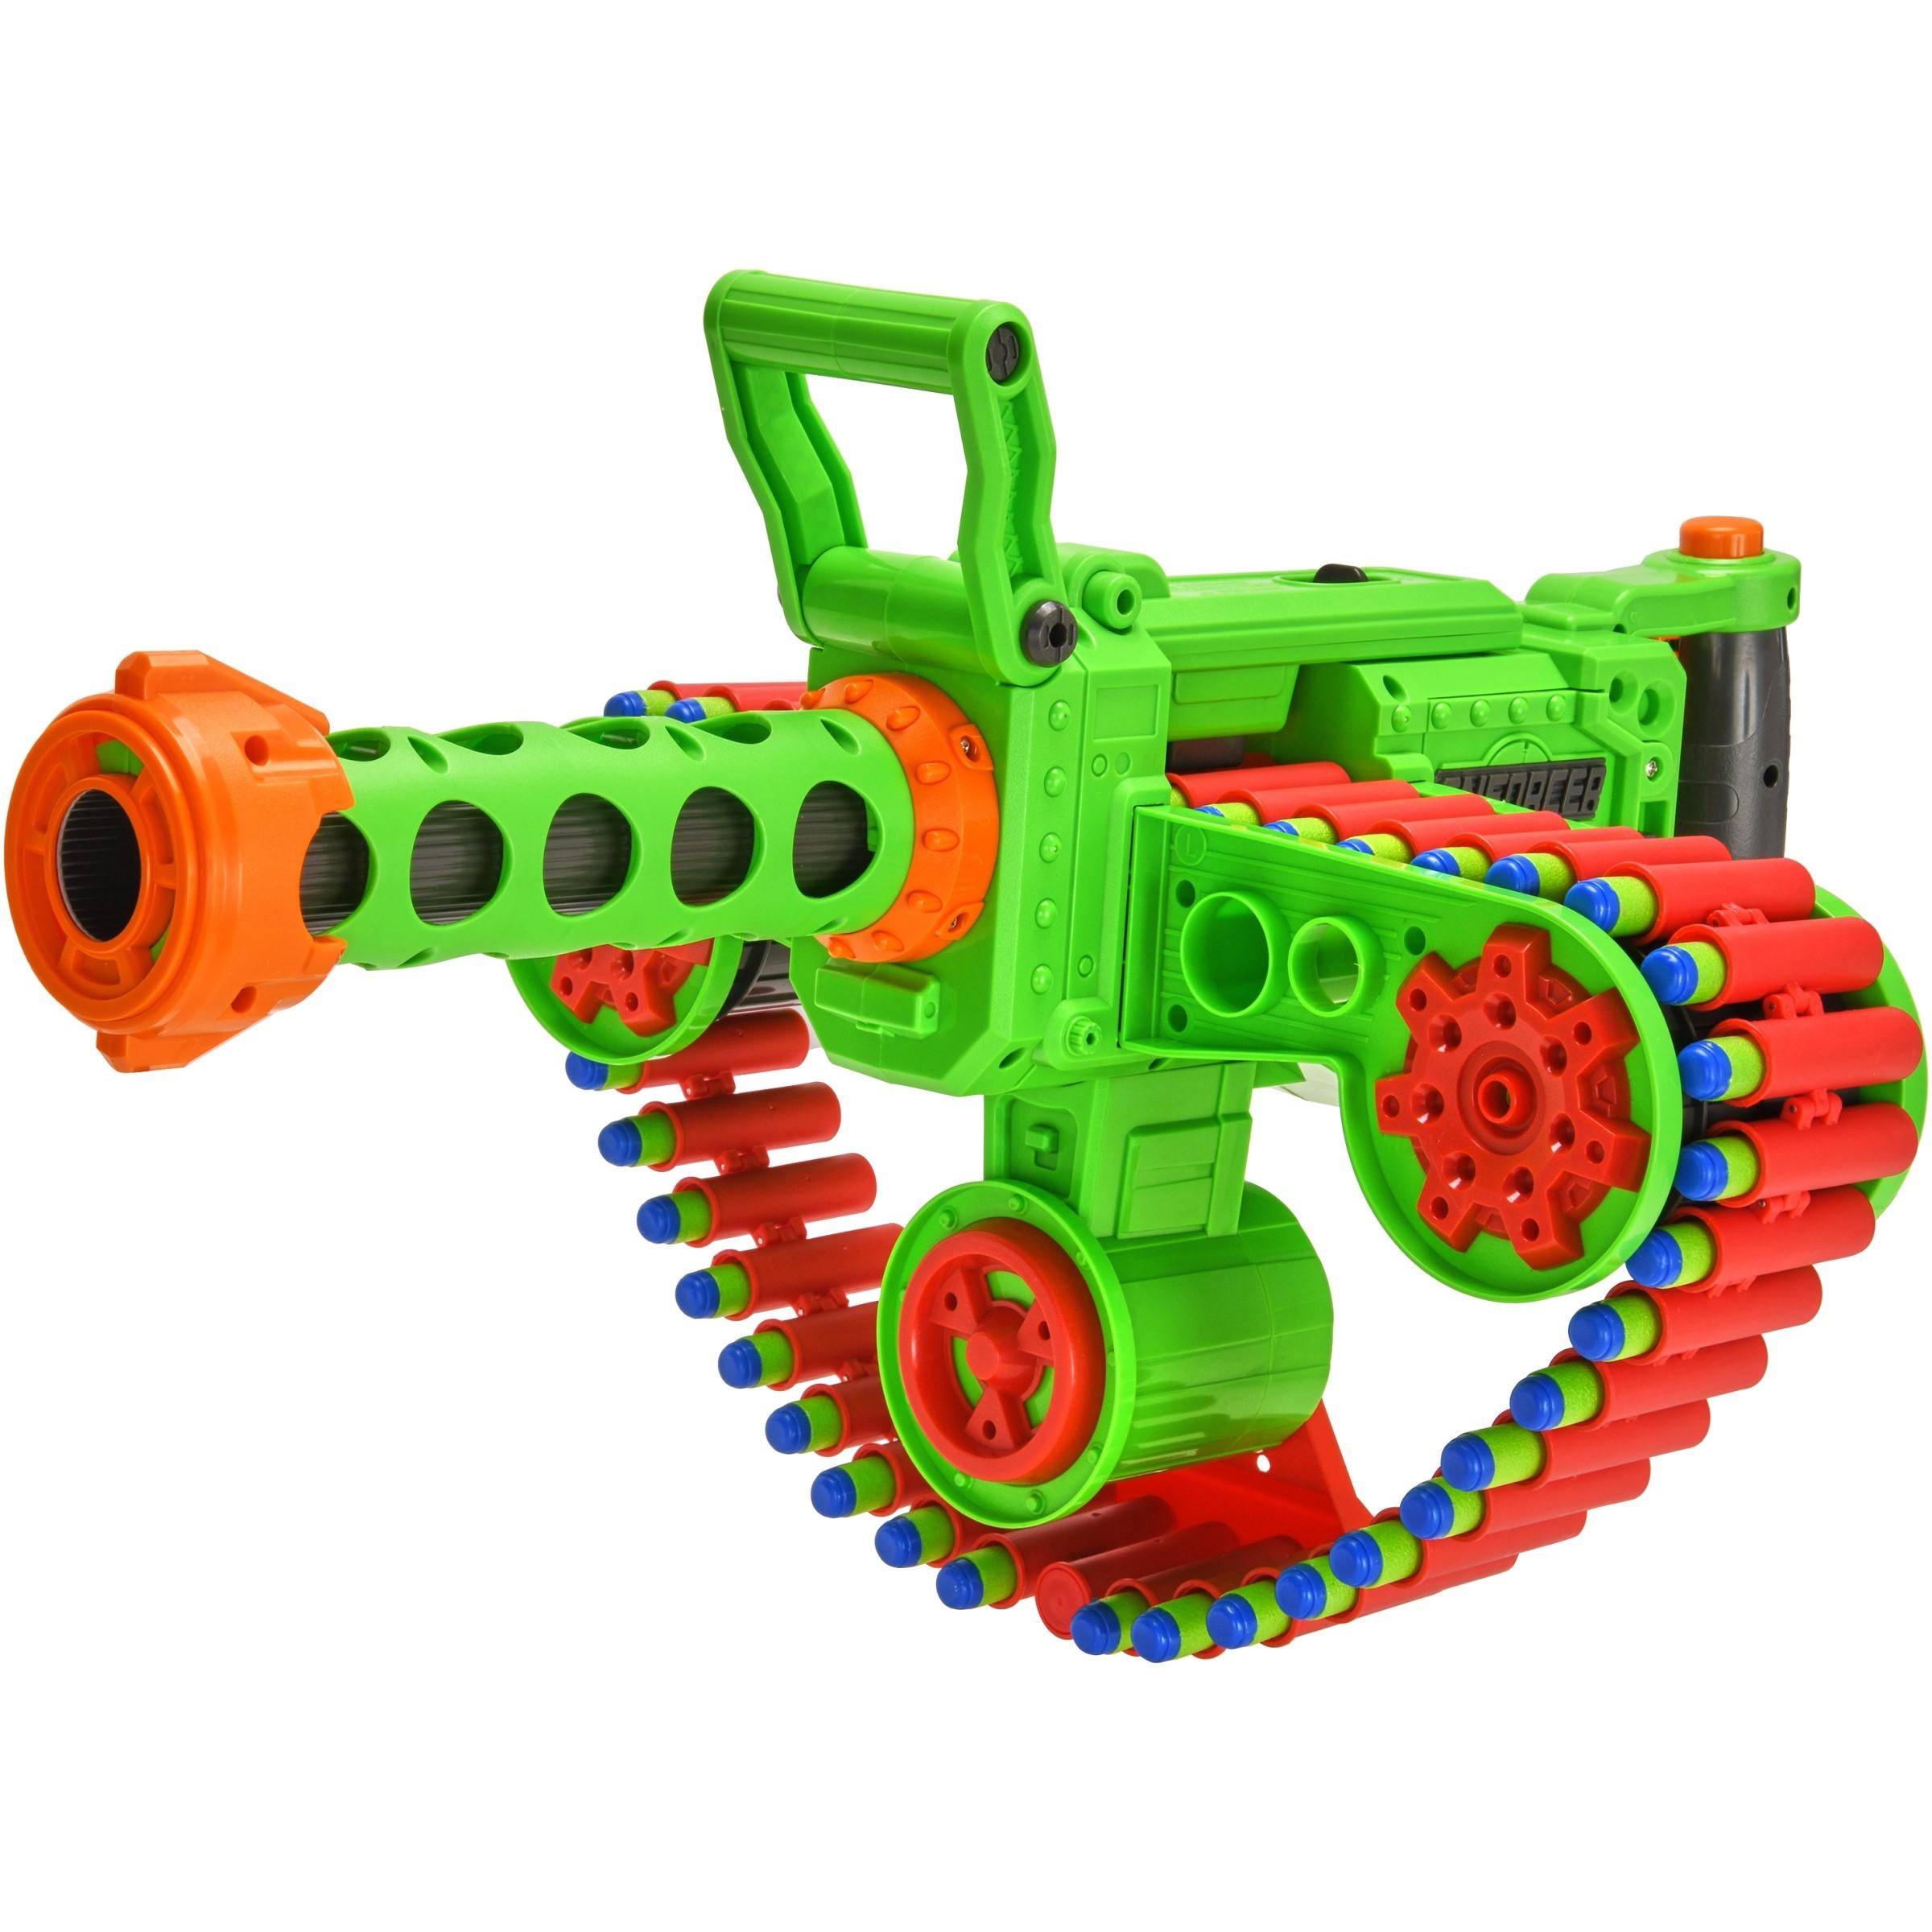 Adventure Force Enforcer Full-Auto Belt Blaster, Green